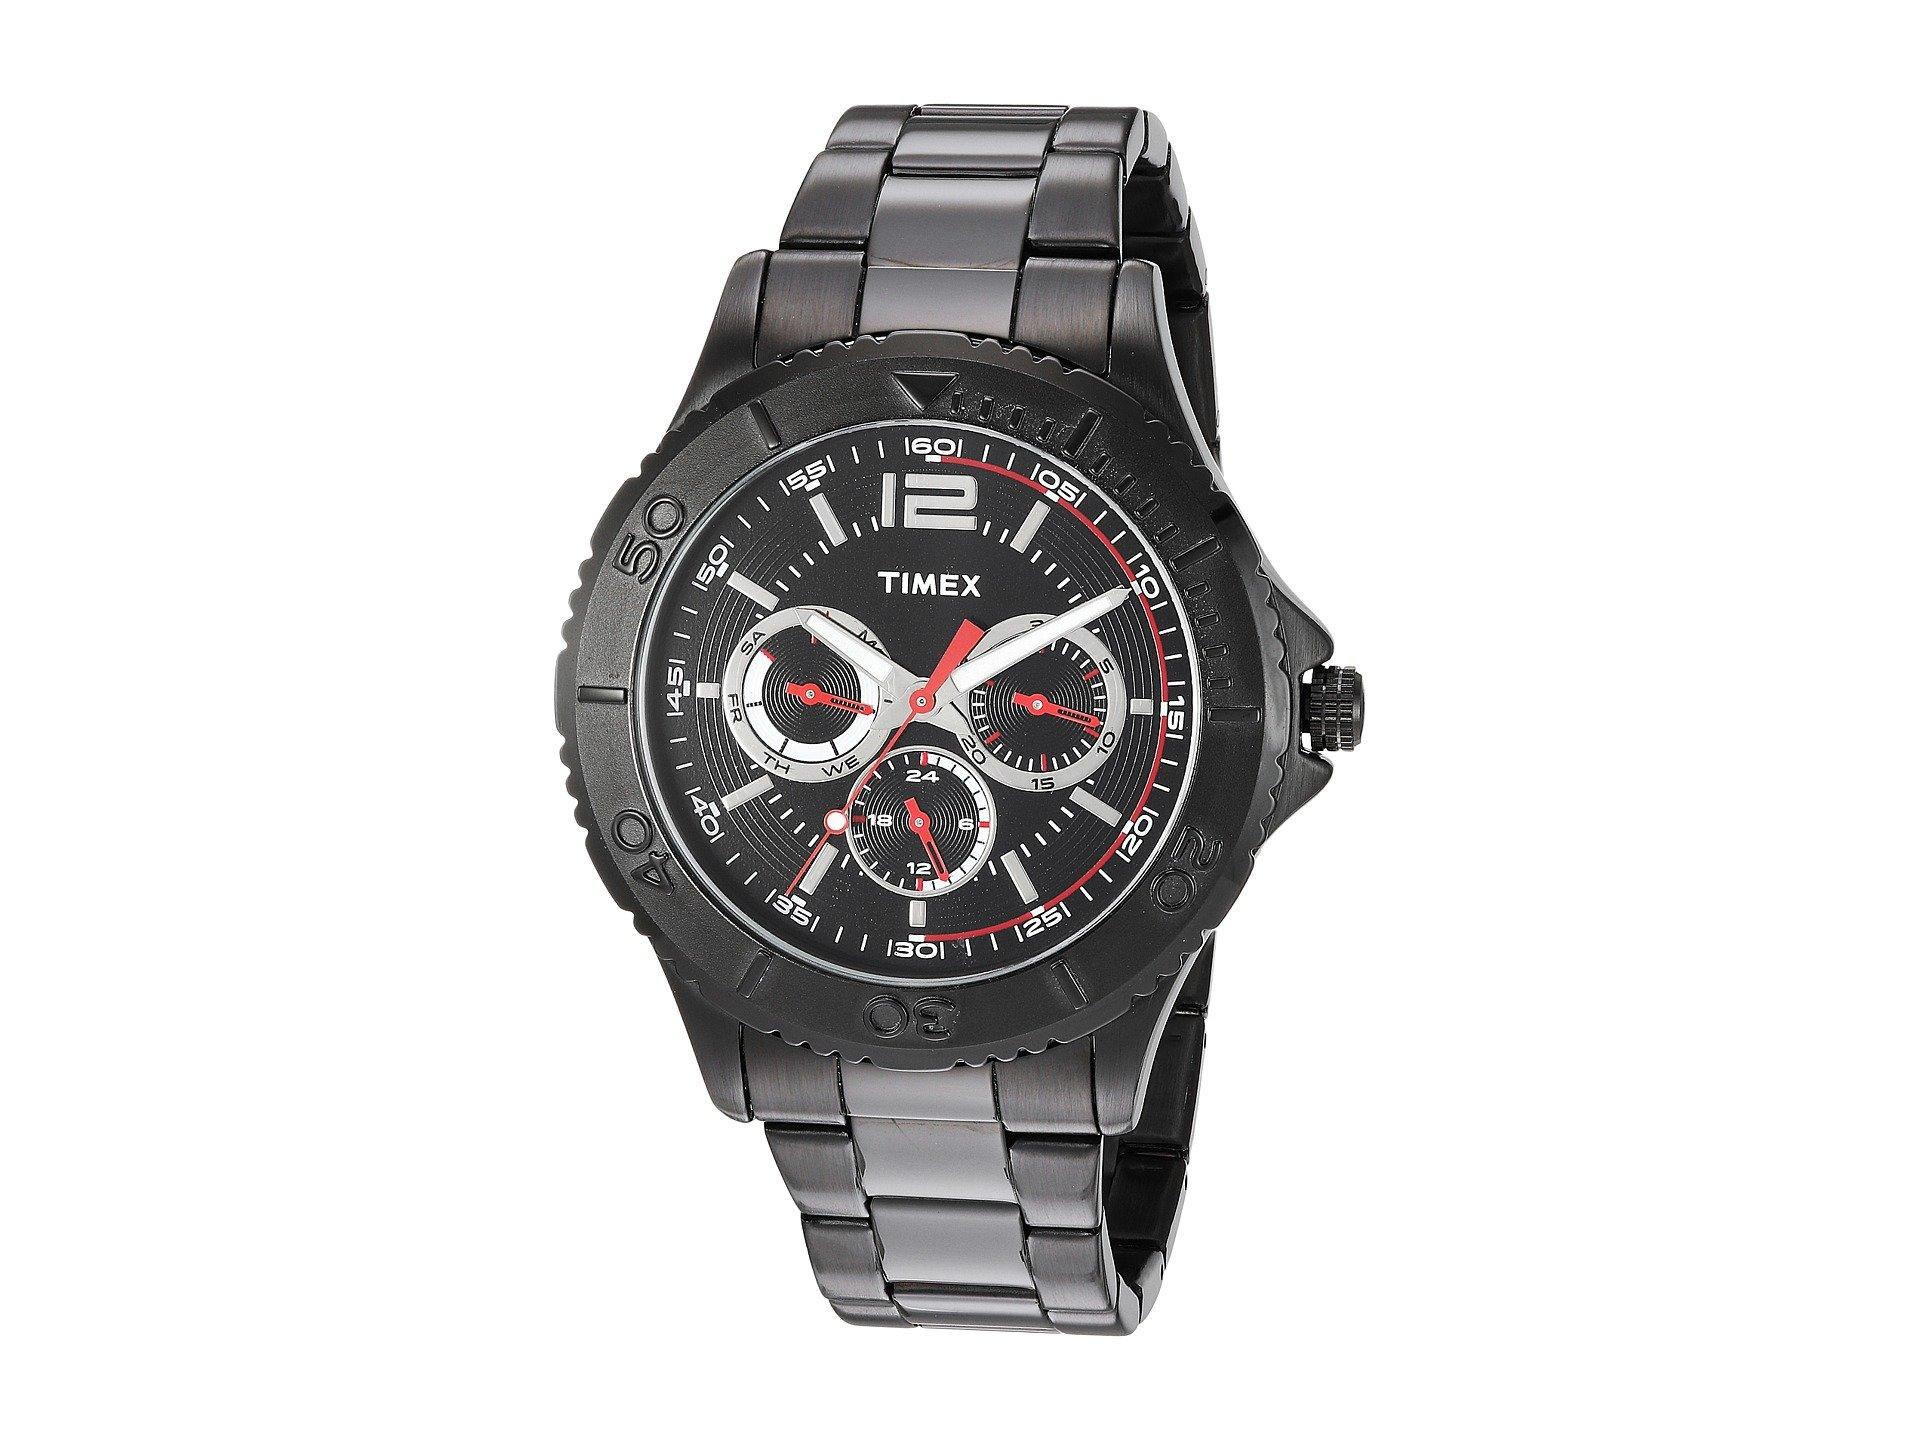 Reloj para Hombre Timex Taft Street  + Timex en VeoyCompro.net